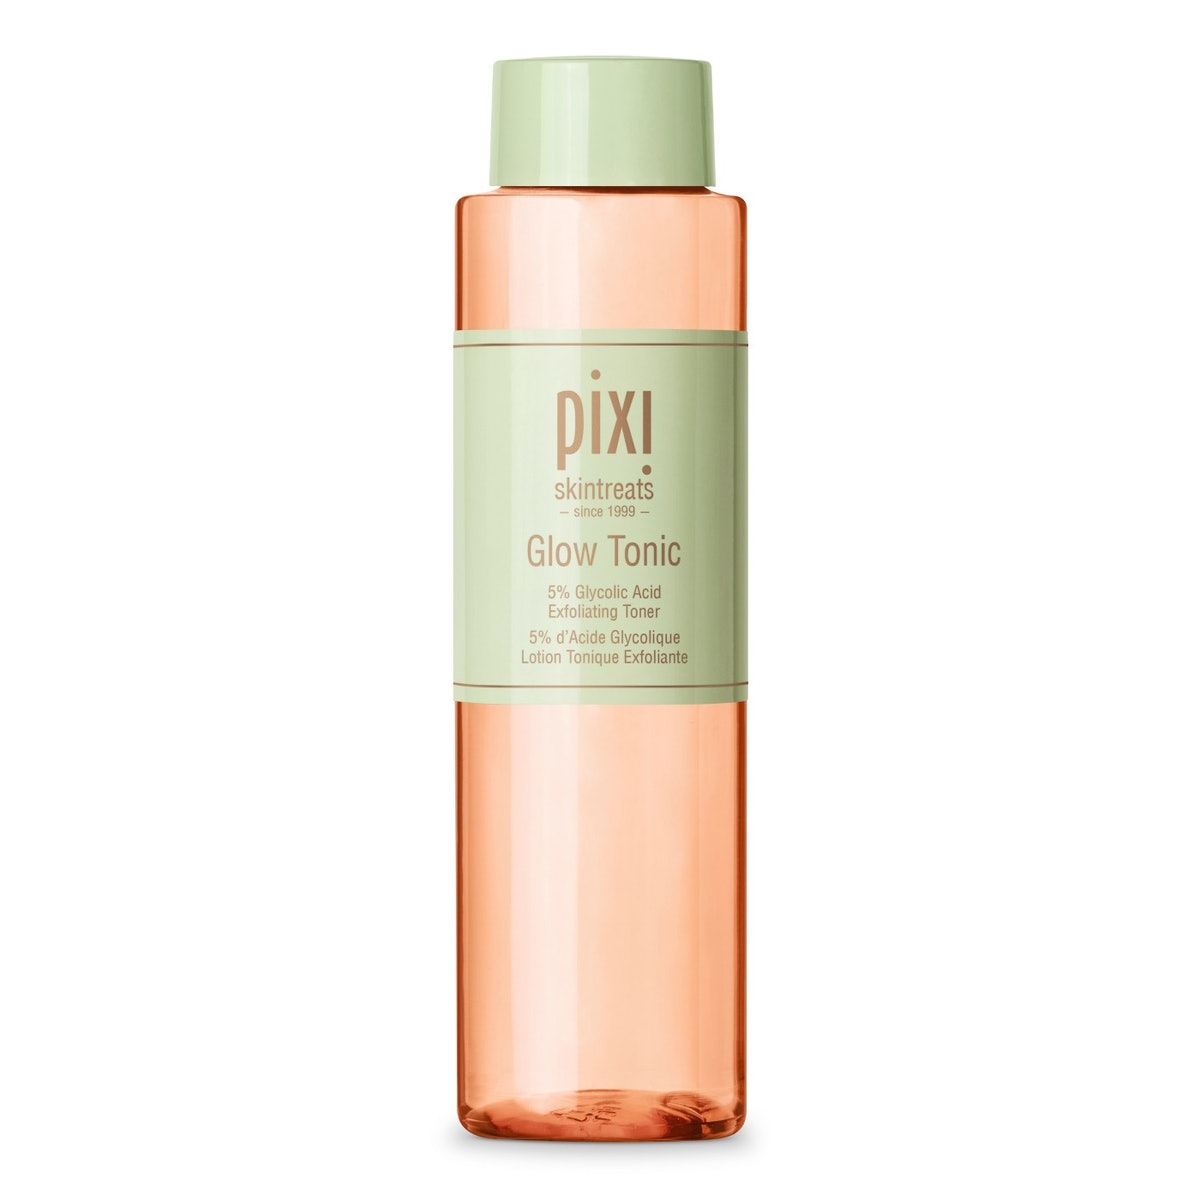 Pixi Glow Tonic Facial Treatments